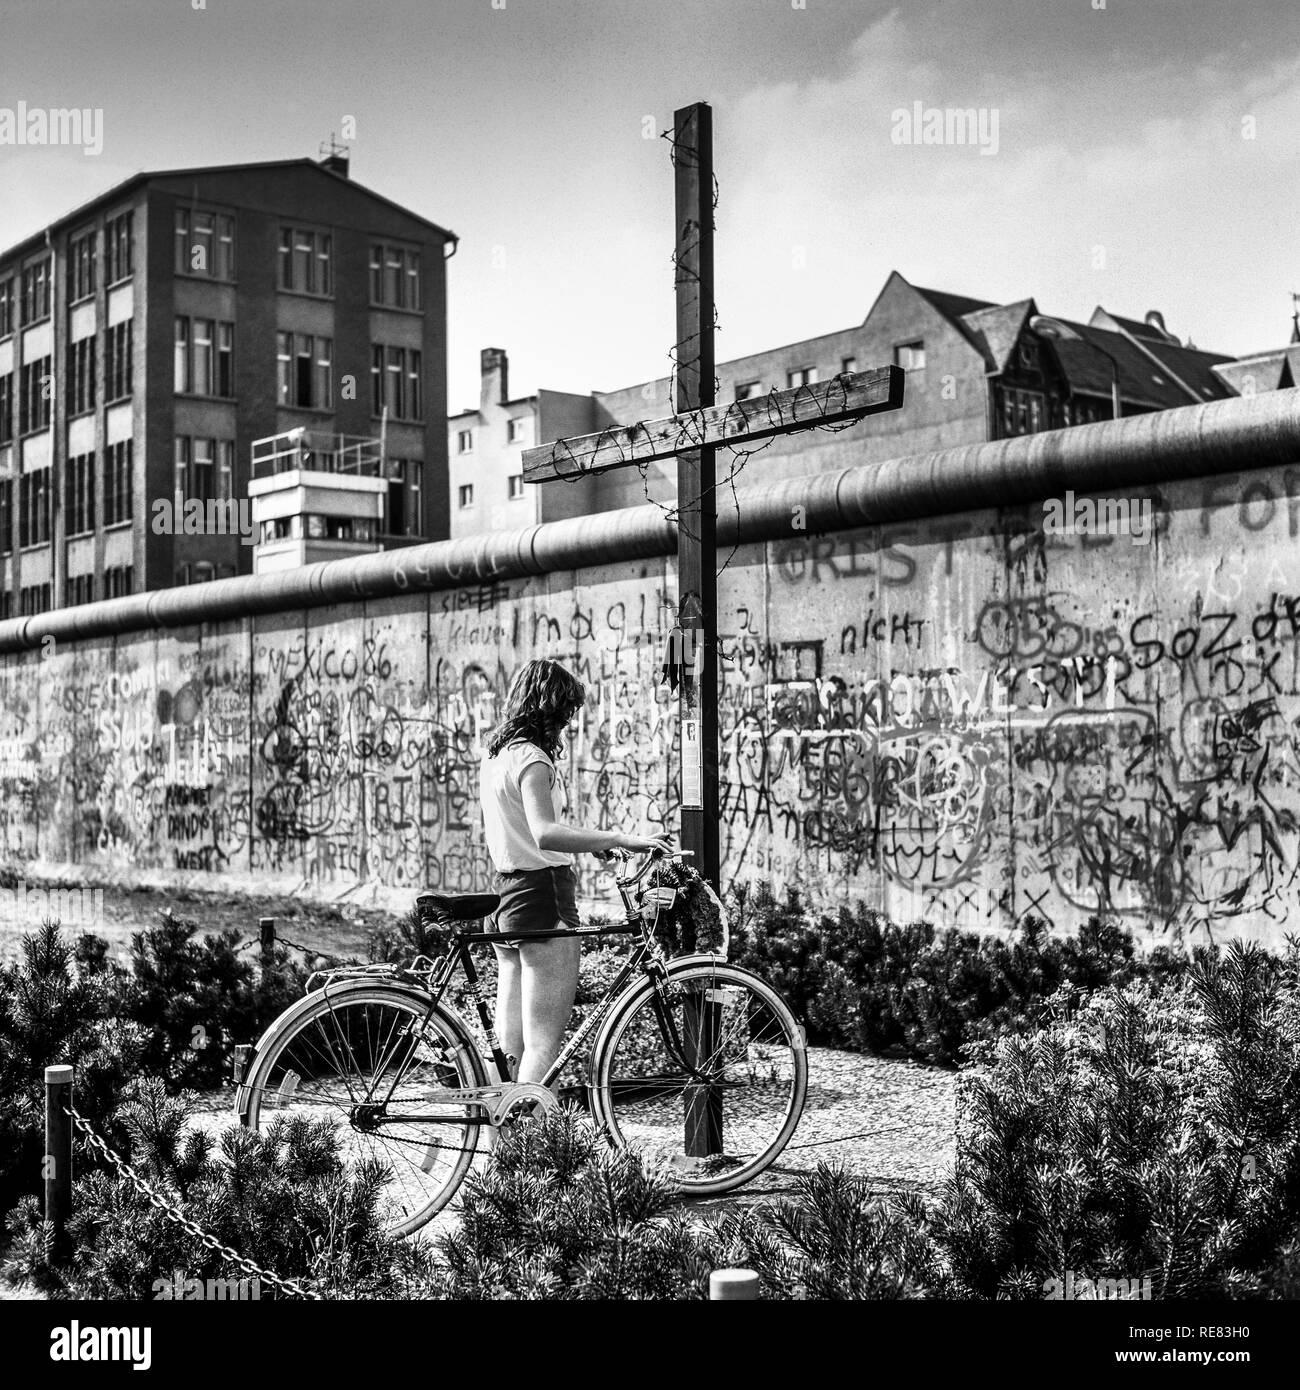 August 1986, young woman with bike, Peter Fechter memorial, graffitis on Berlin Wall, Zimmerstrasse street, Kreuzberg, West Berlin, Germany, Europe, - Stock Image